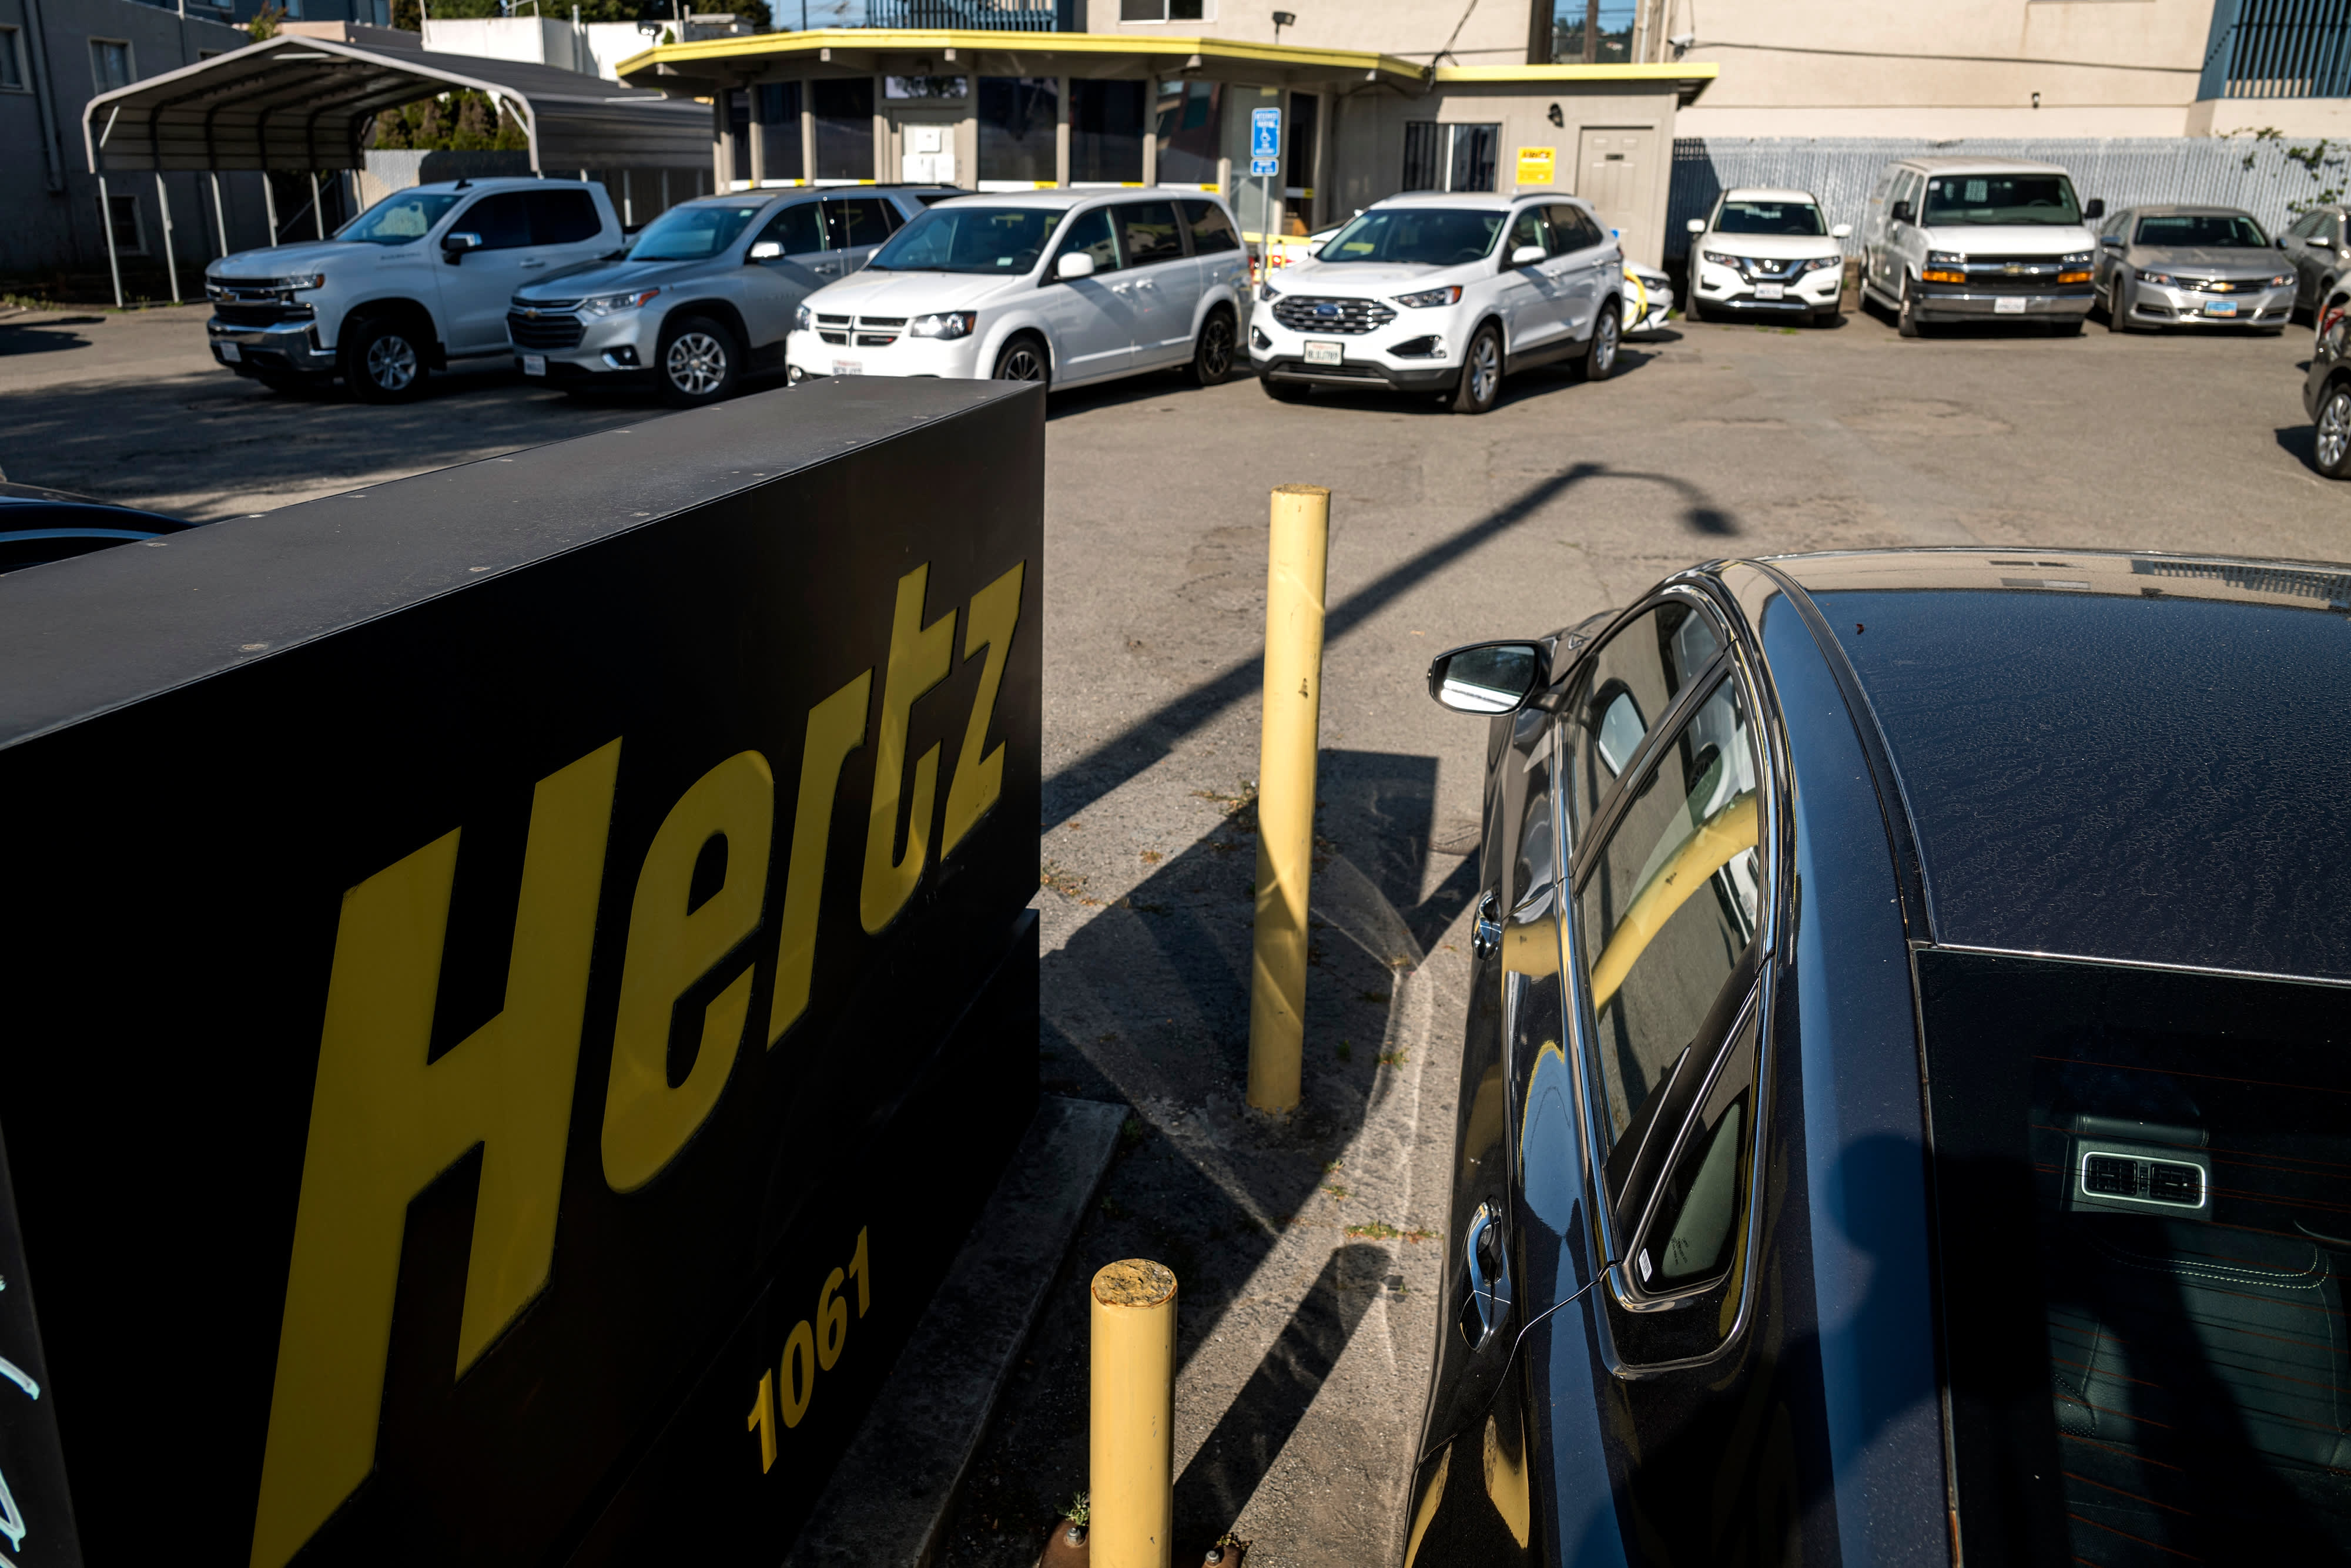 Hertz bankruptcy, distressed rental car market hurts U.S. automakers